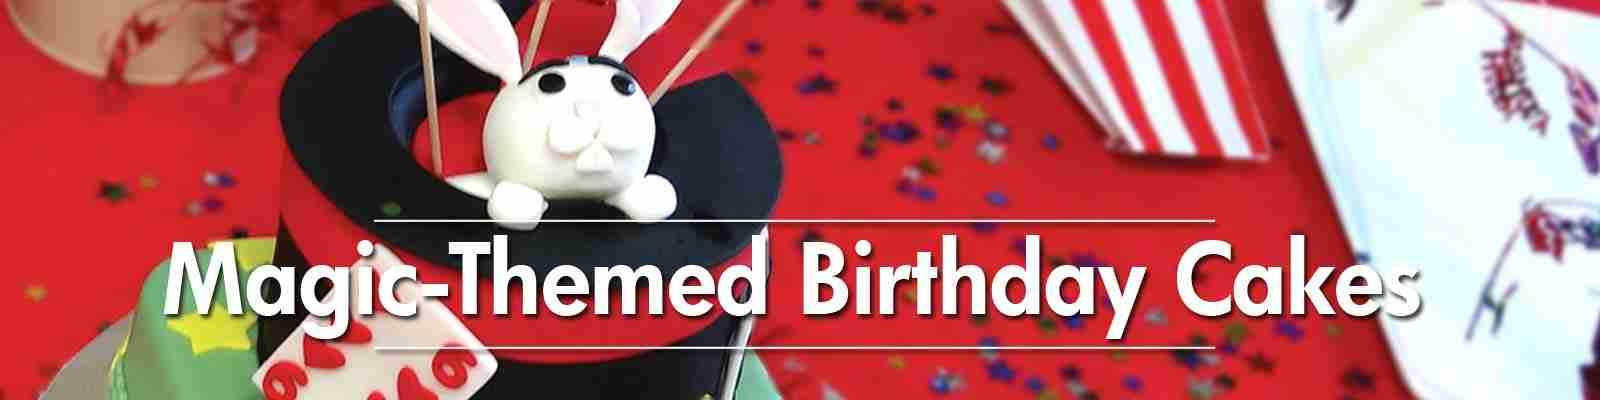 Magic Show Birthday Party Cake